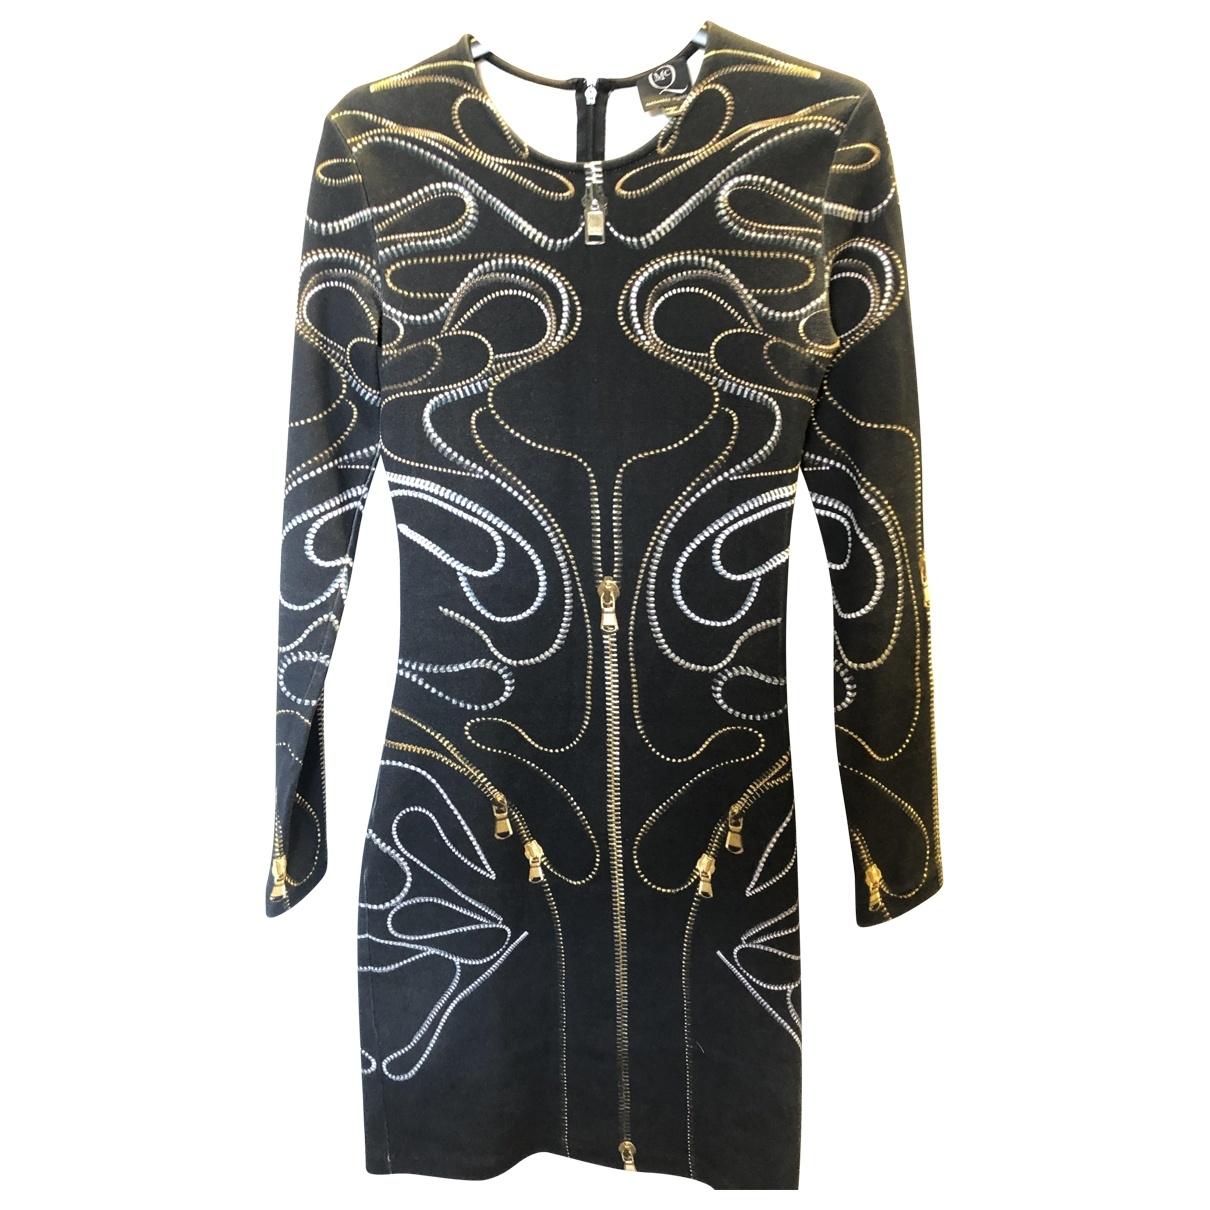 Mcq - Robe   pour femme en coton - elasthane - noir